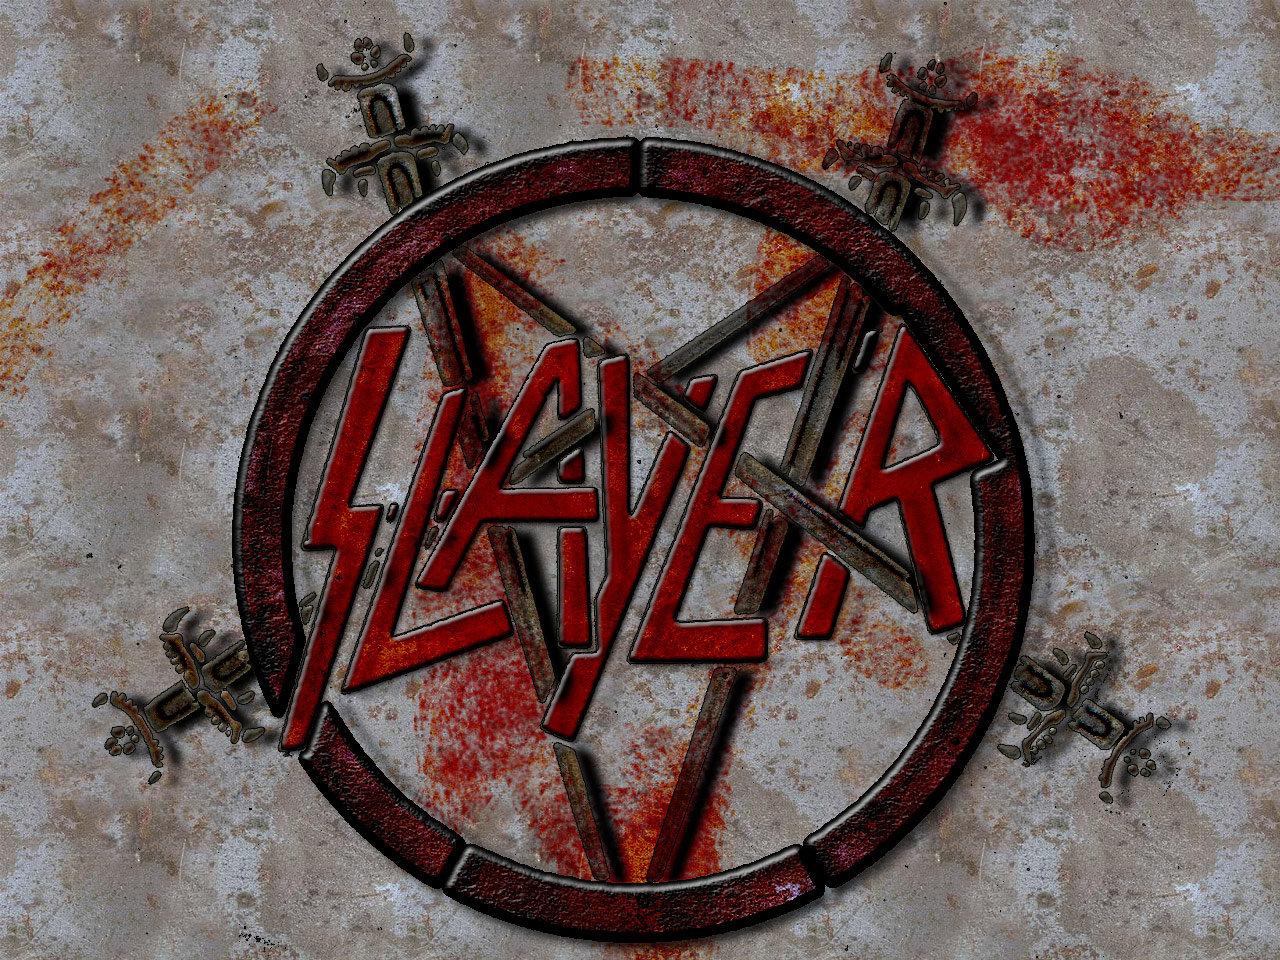 Slayer Wallpaper by smops 1280x960